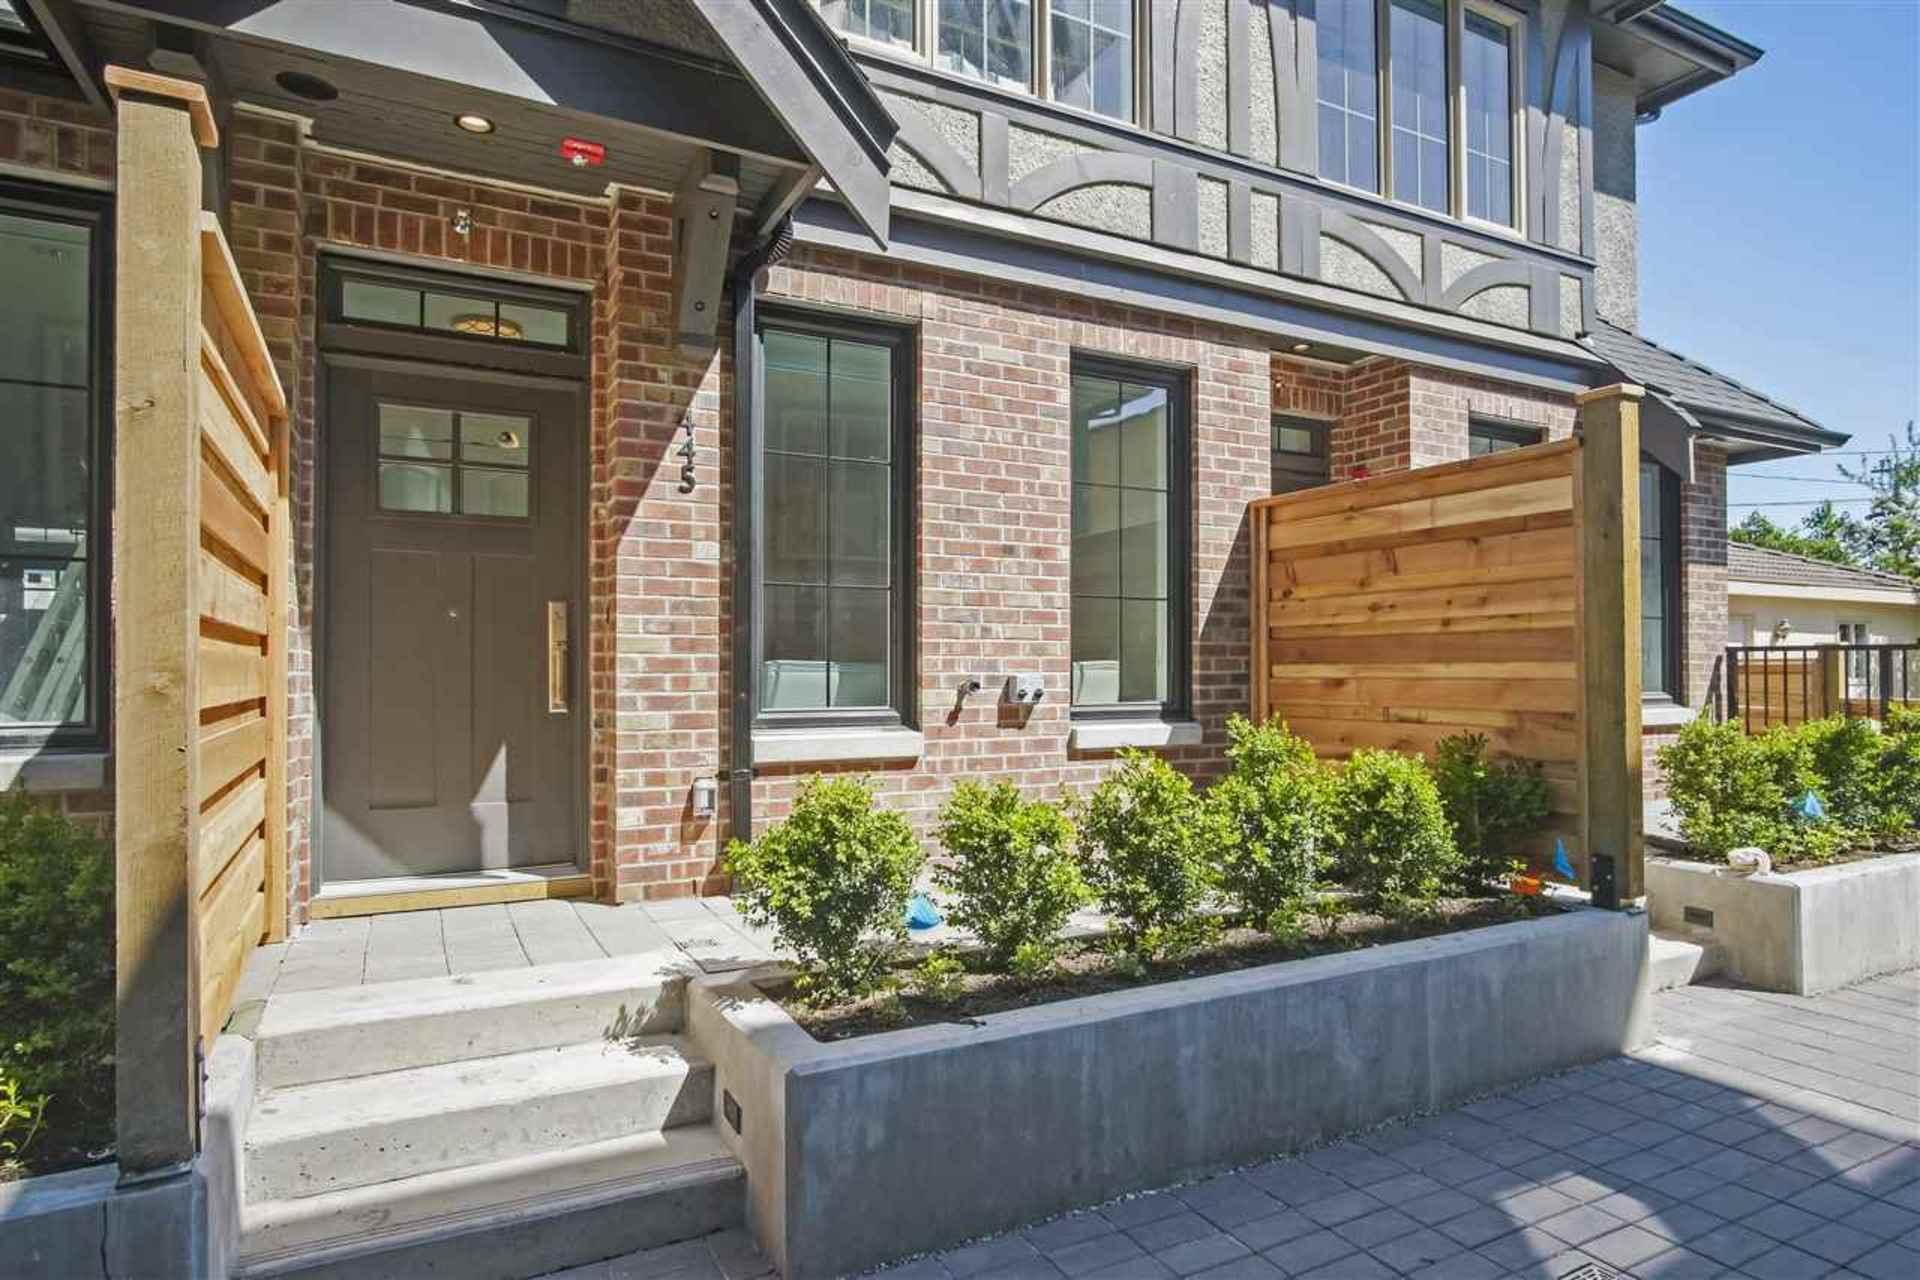 443-w-63-avenue-marpole-vancouver-west-01 at SL3 - 443 W 63 Avenue, Marpole, Vancouver West